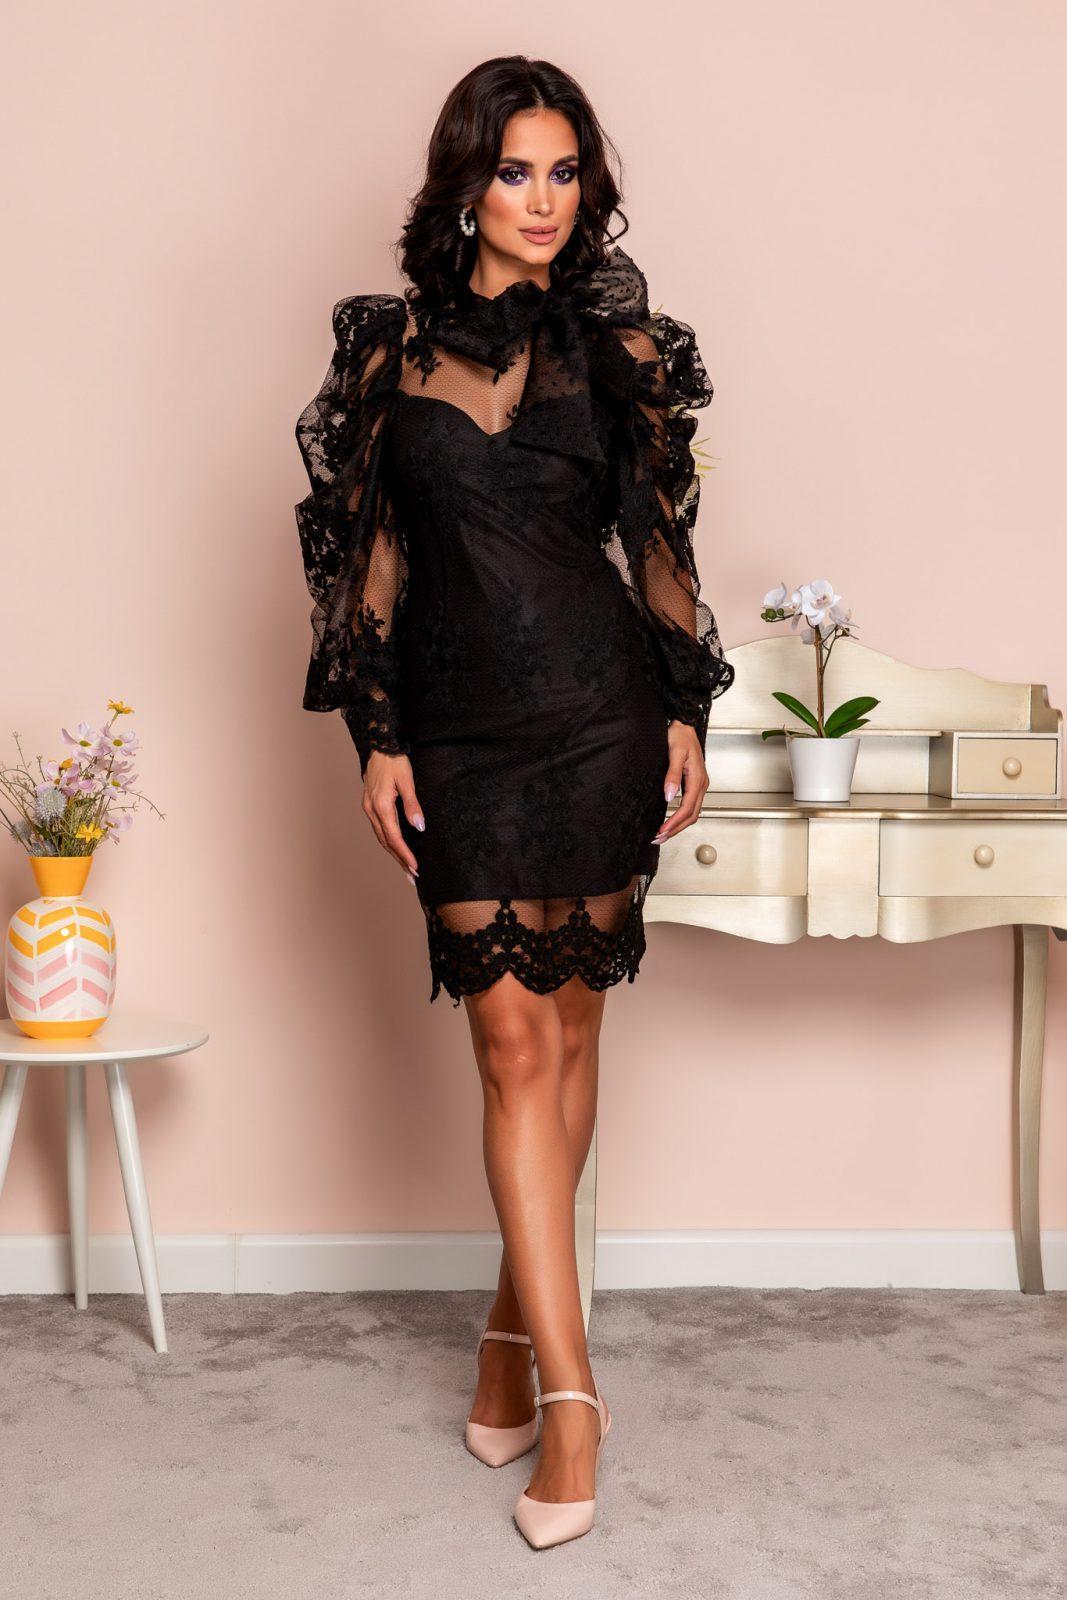 Ozana Black Dress